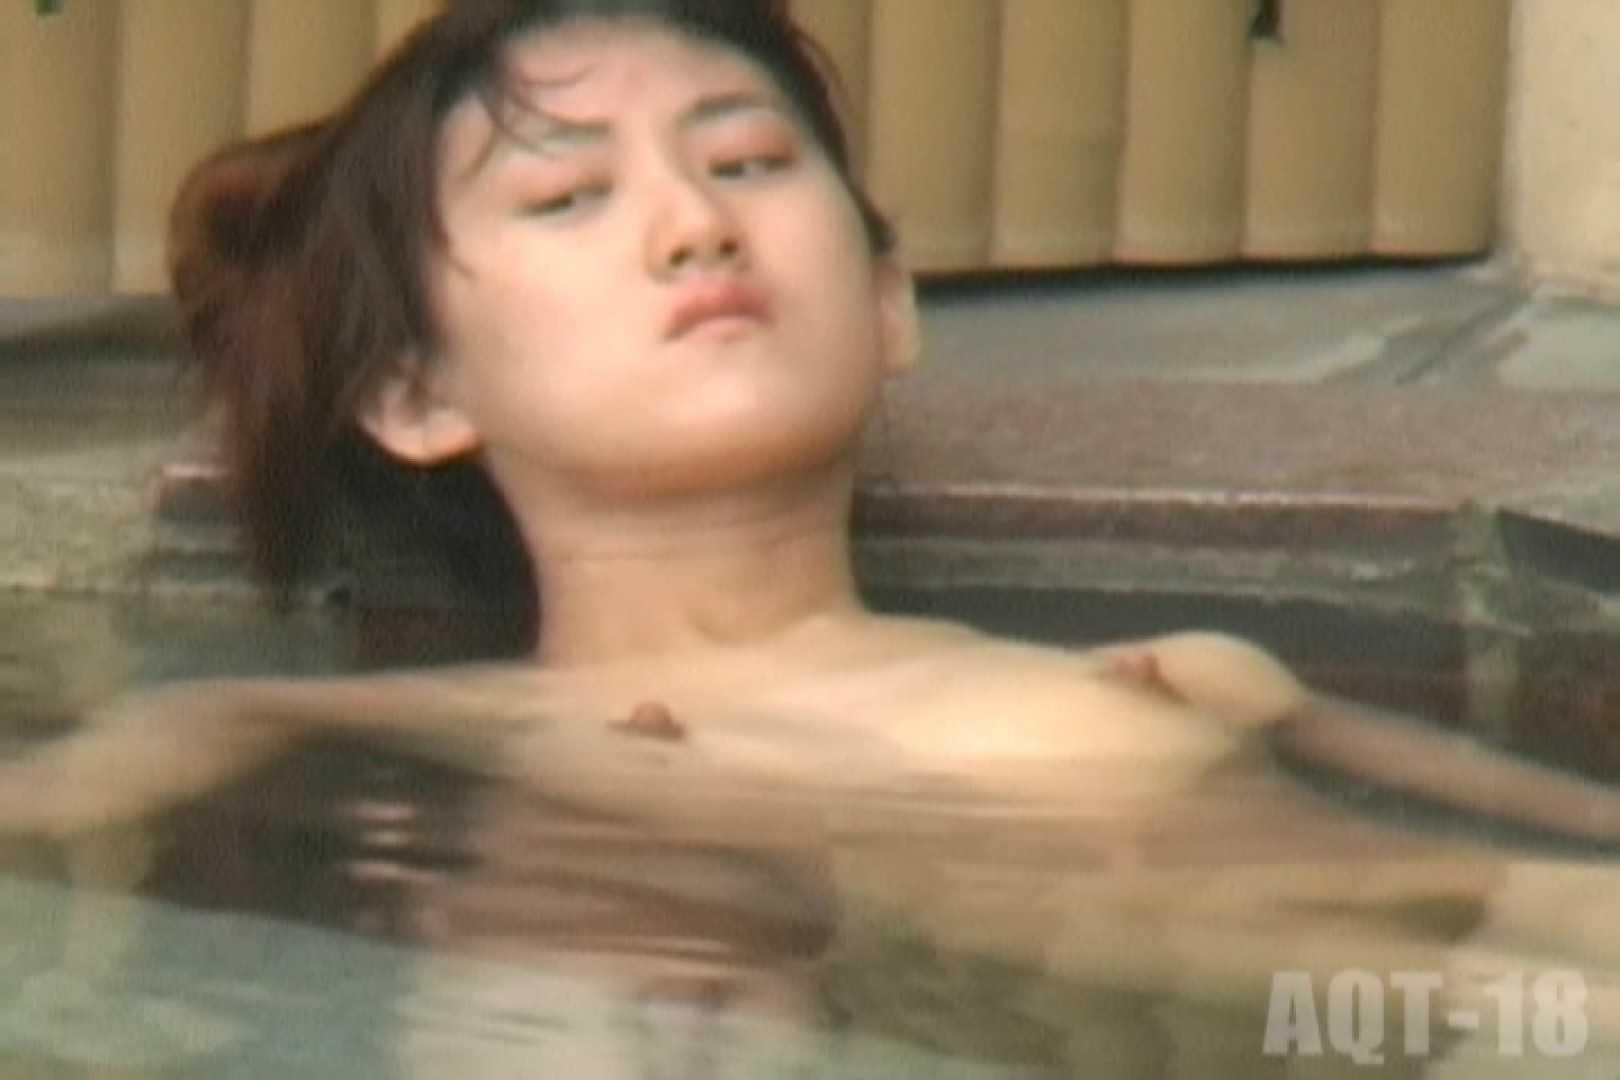 Aquaな露天風呂Vol.862 盗撮師作品  99pic 63